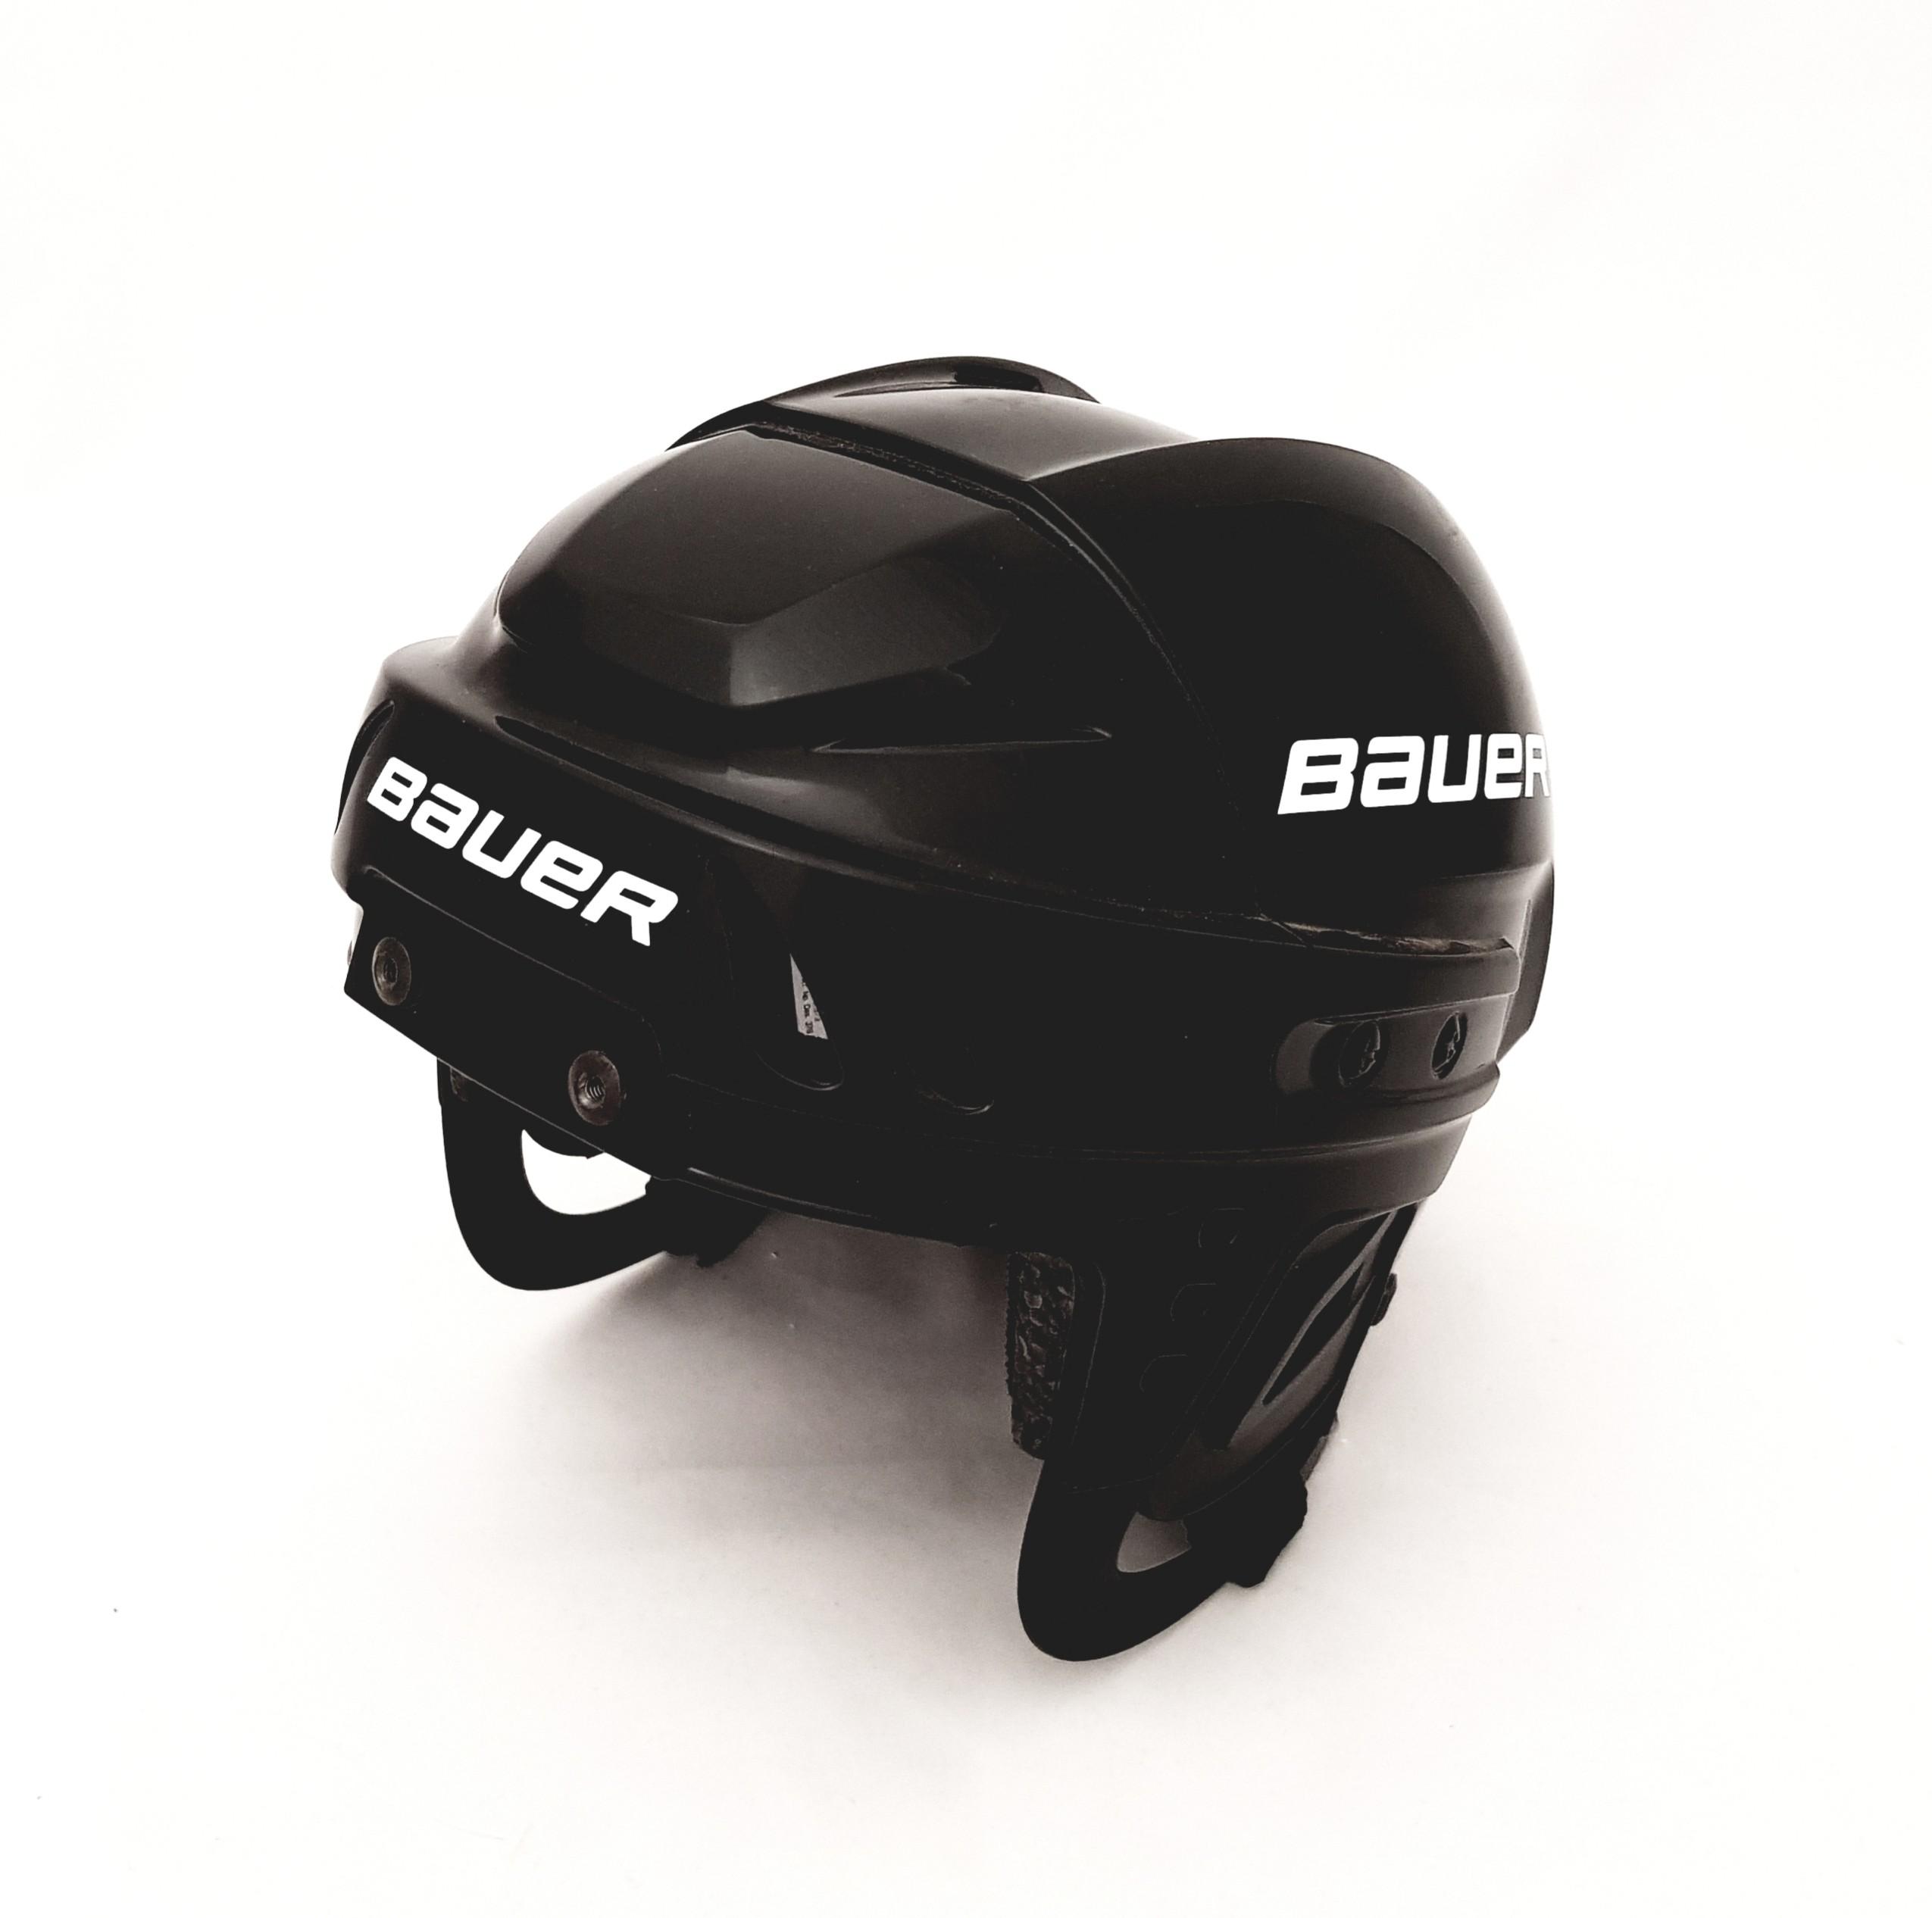 BAUER M-10 Hokeja Ķivere